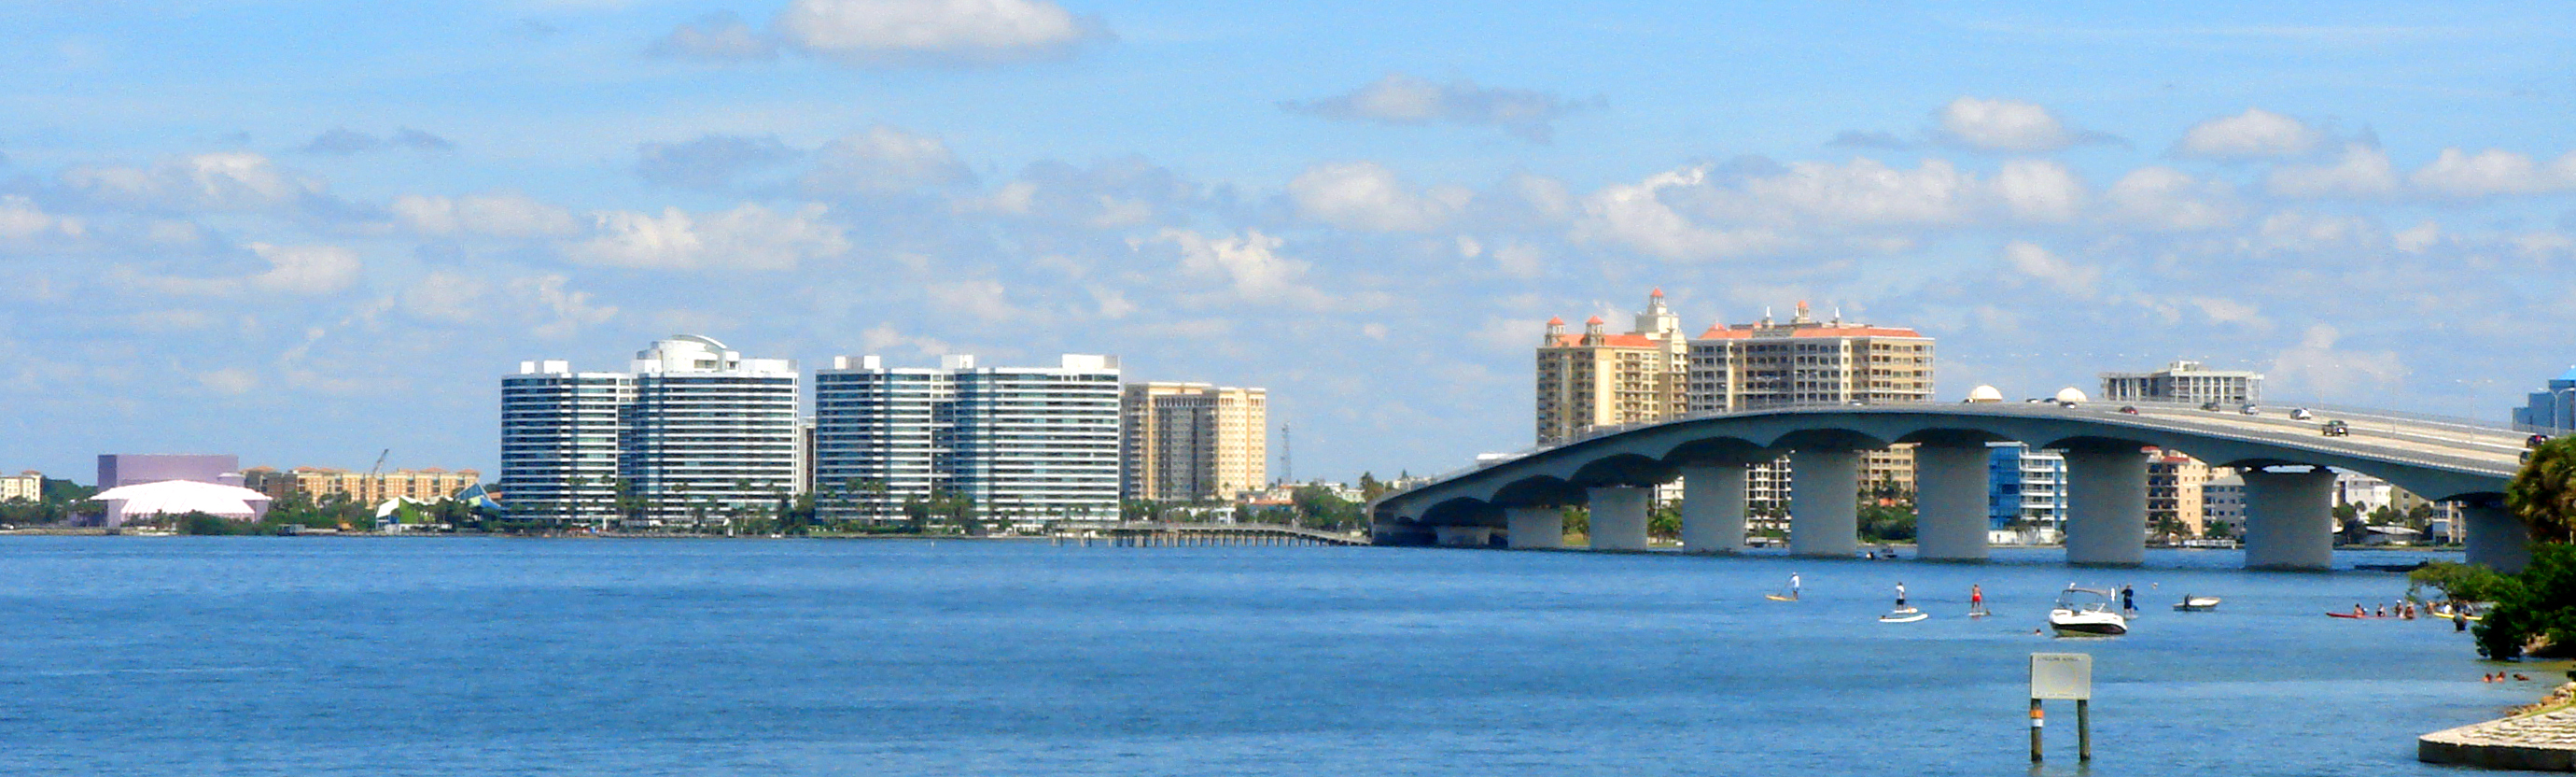 Sarasota Skyline_1.jpg